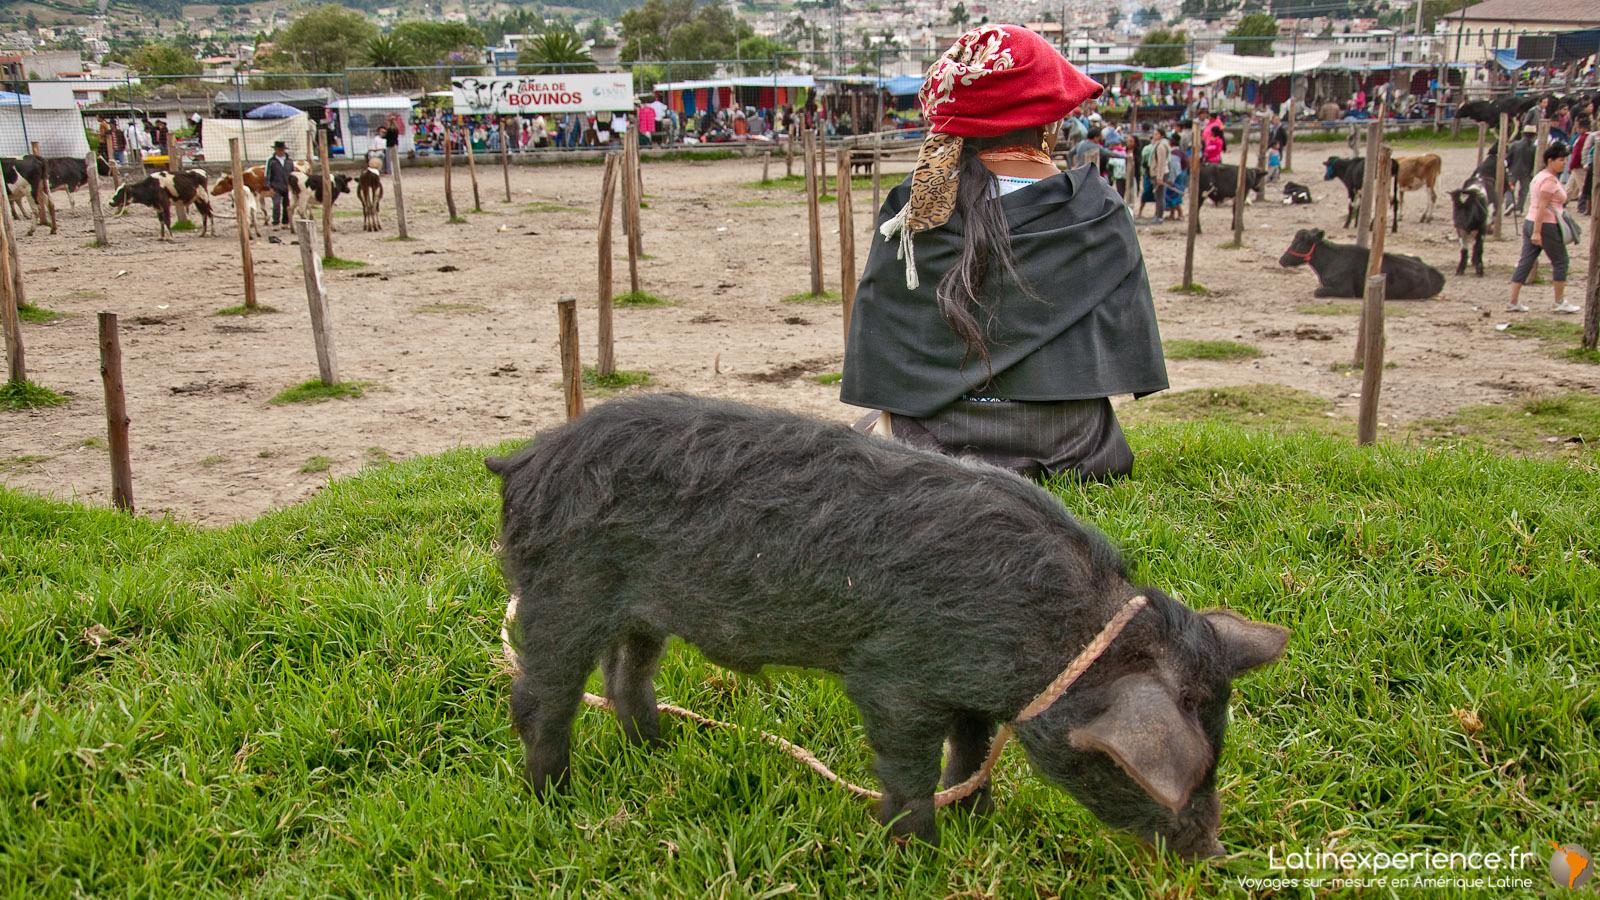 Equateur - Marché Otavalo - Latinexperience voyages